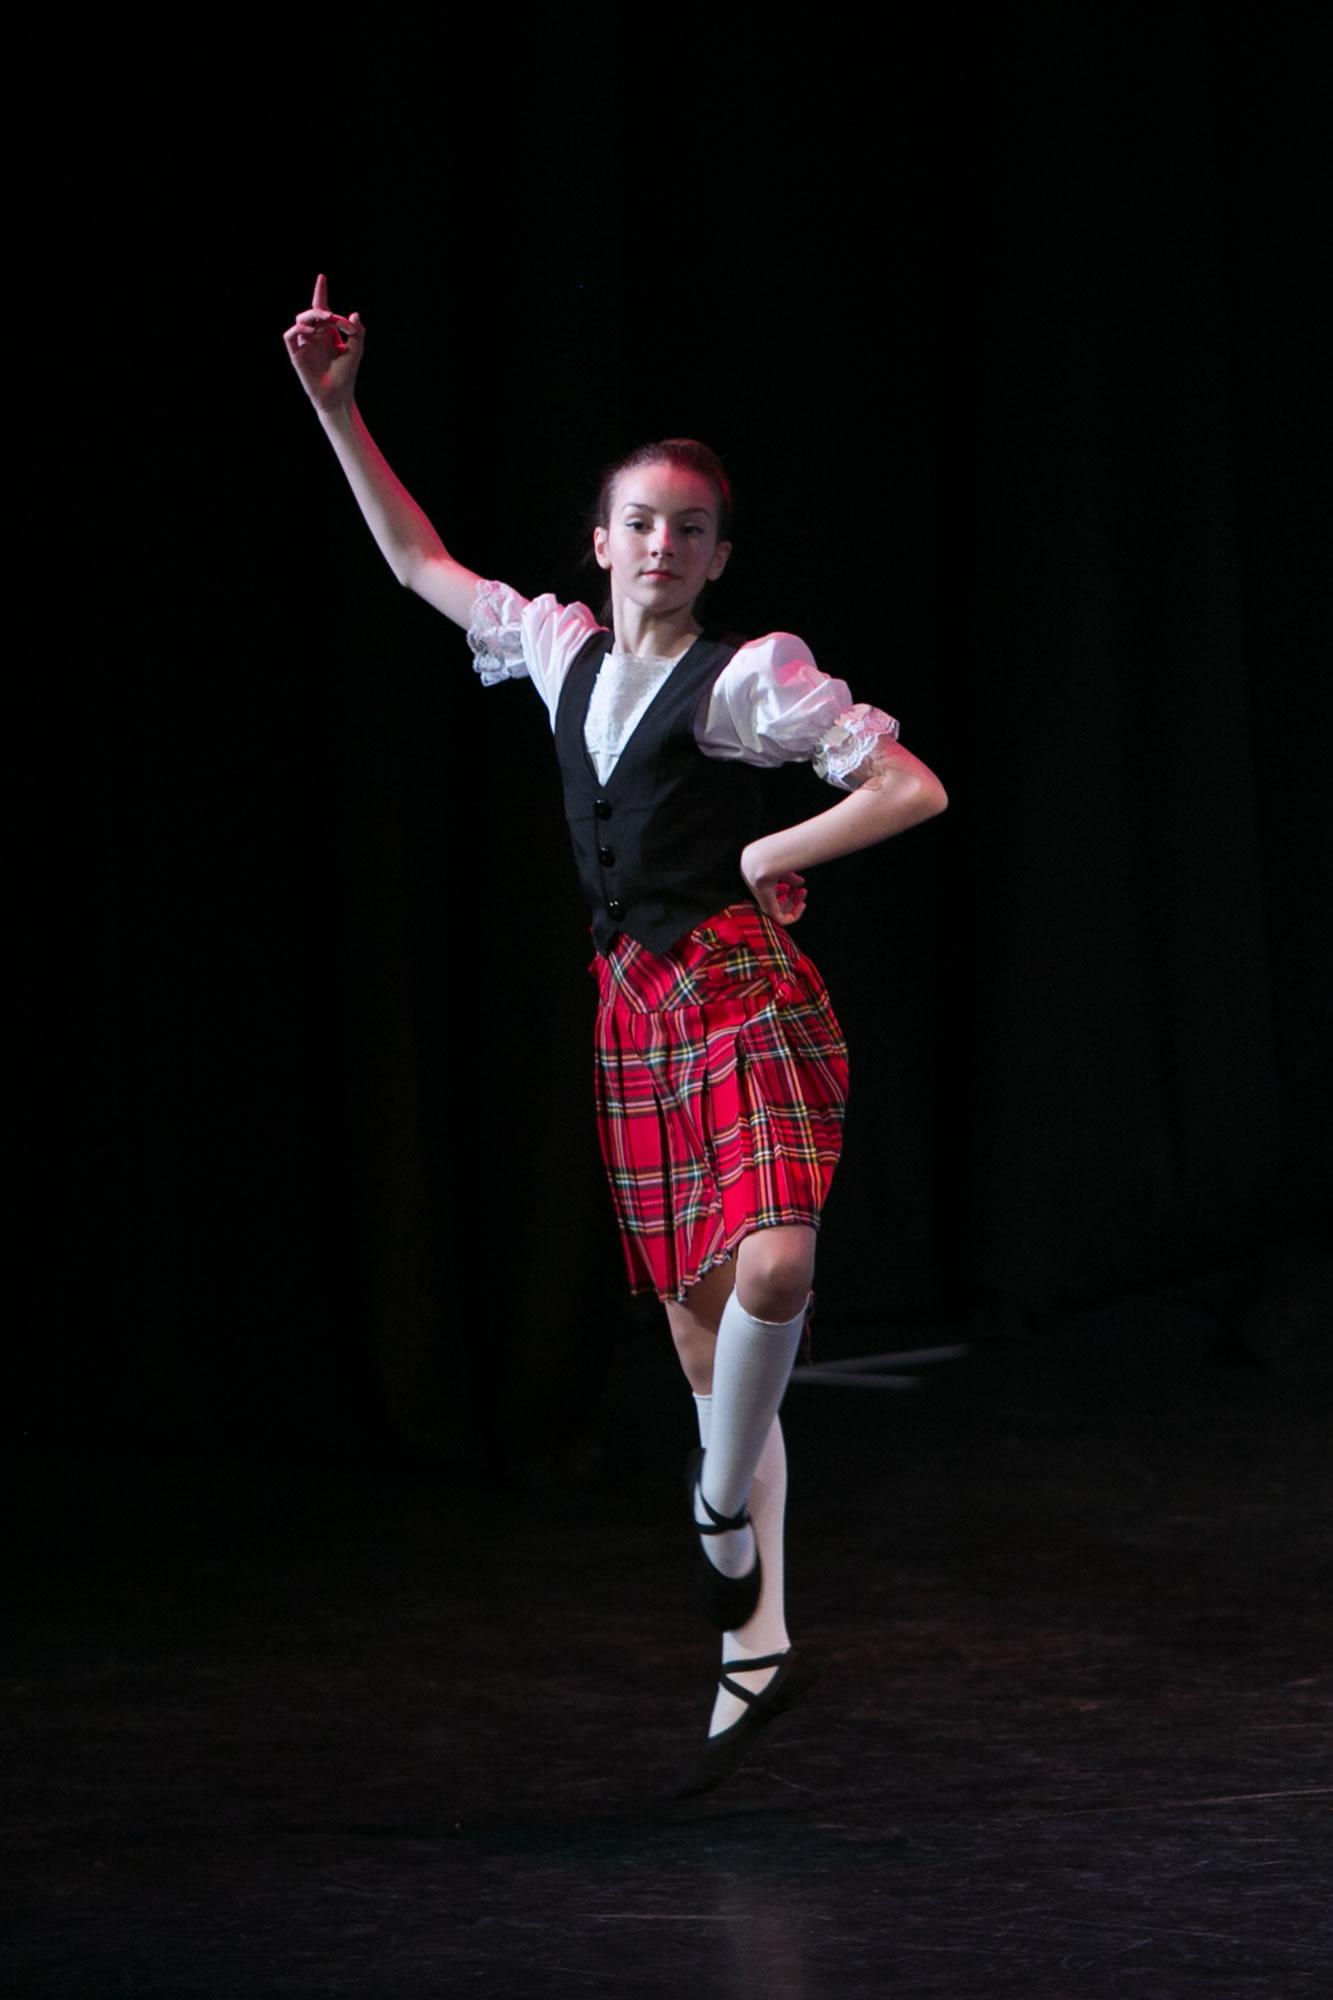 Hitchin_School_of_Dance_Show_2019-SM1_2319.jpg